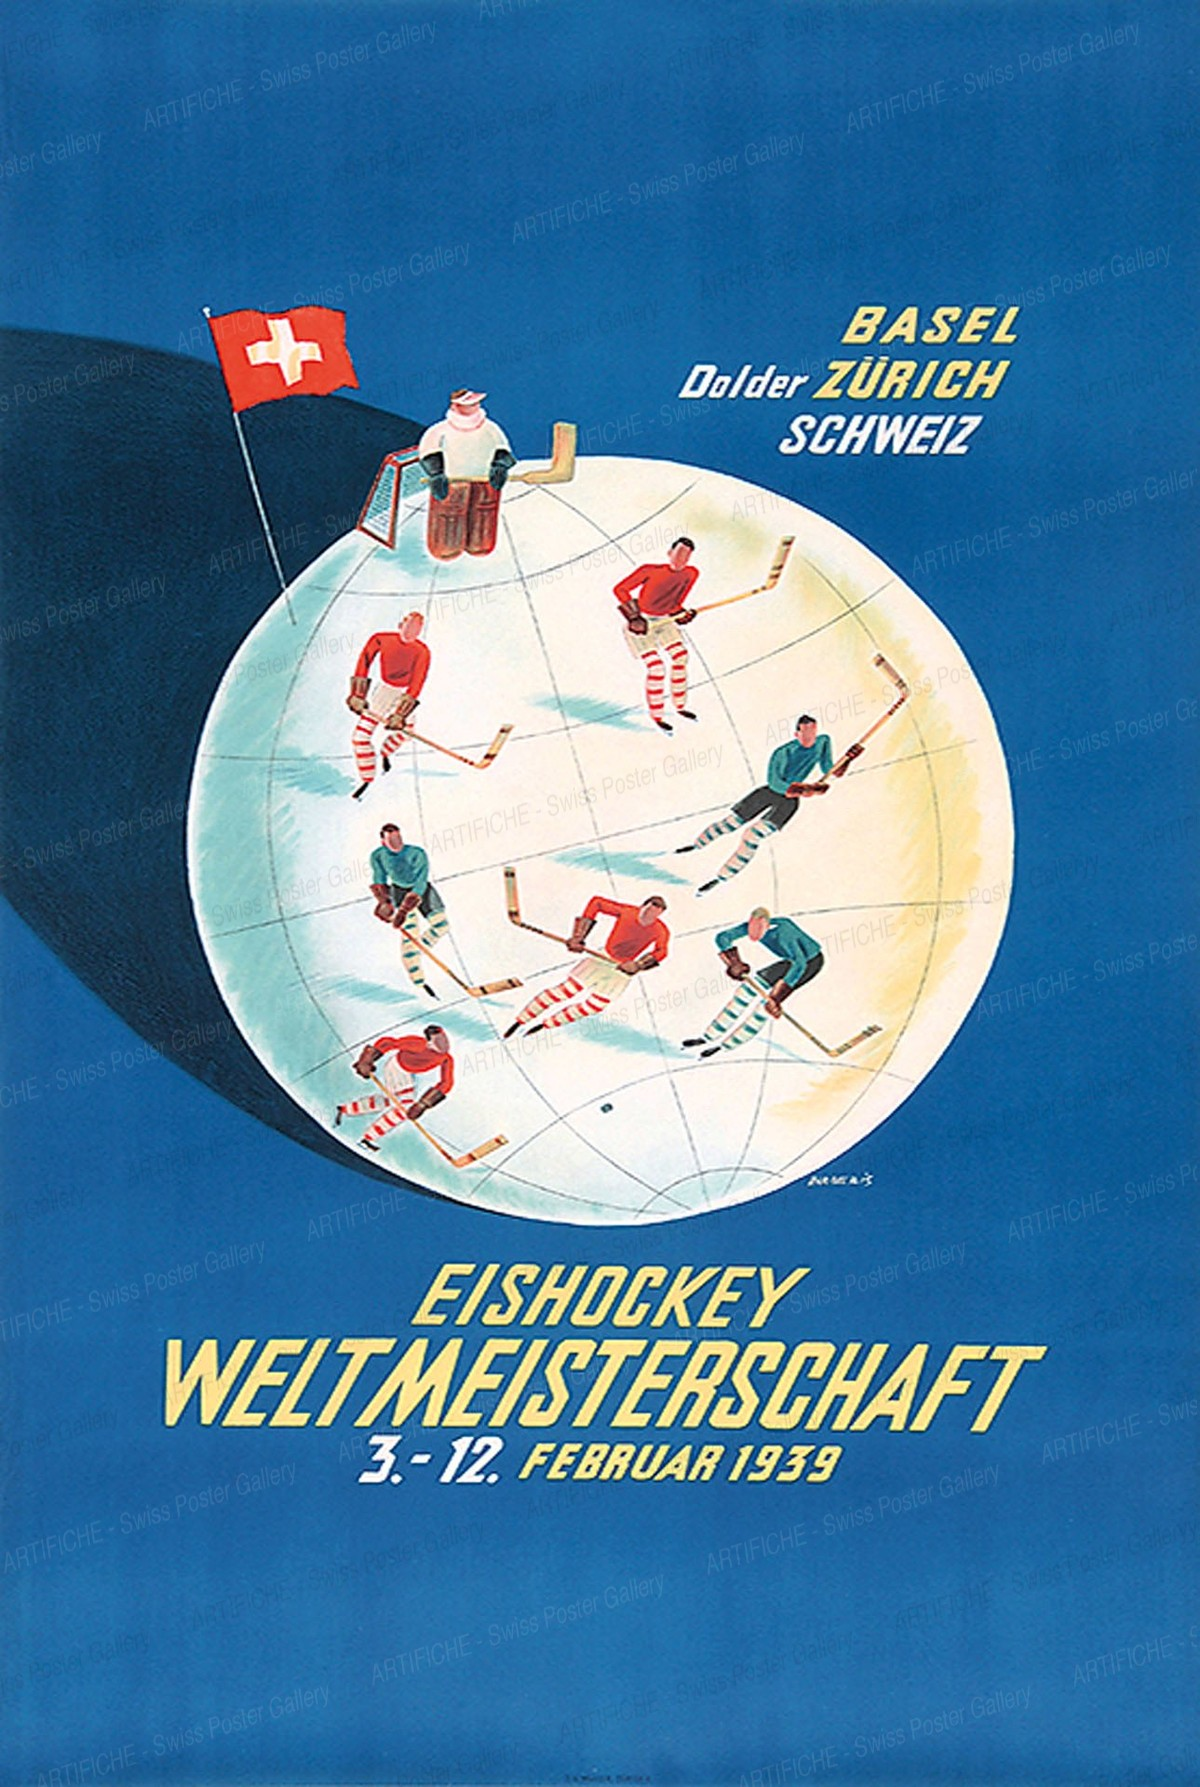 Eishockey Weltmeisterschaft Februar 1939, Franco Barberis